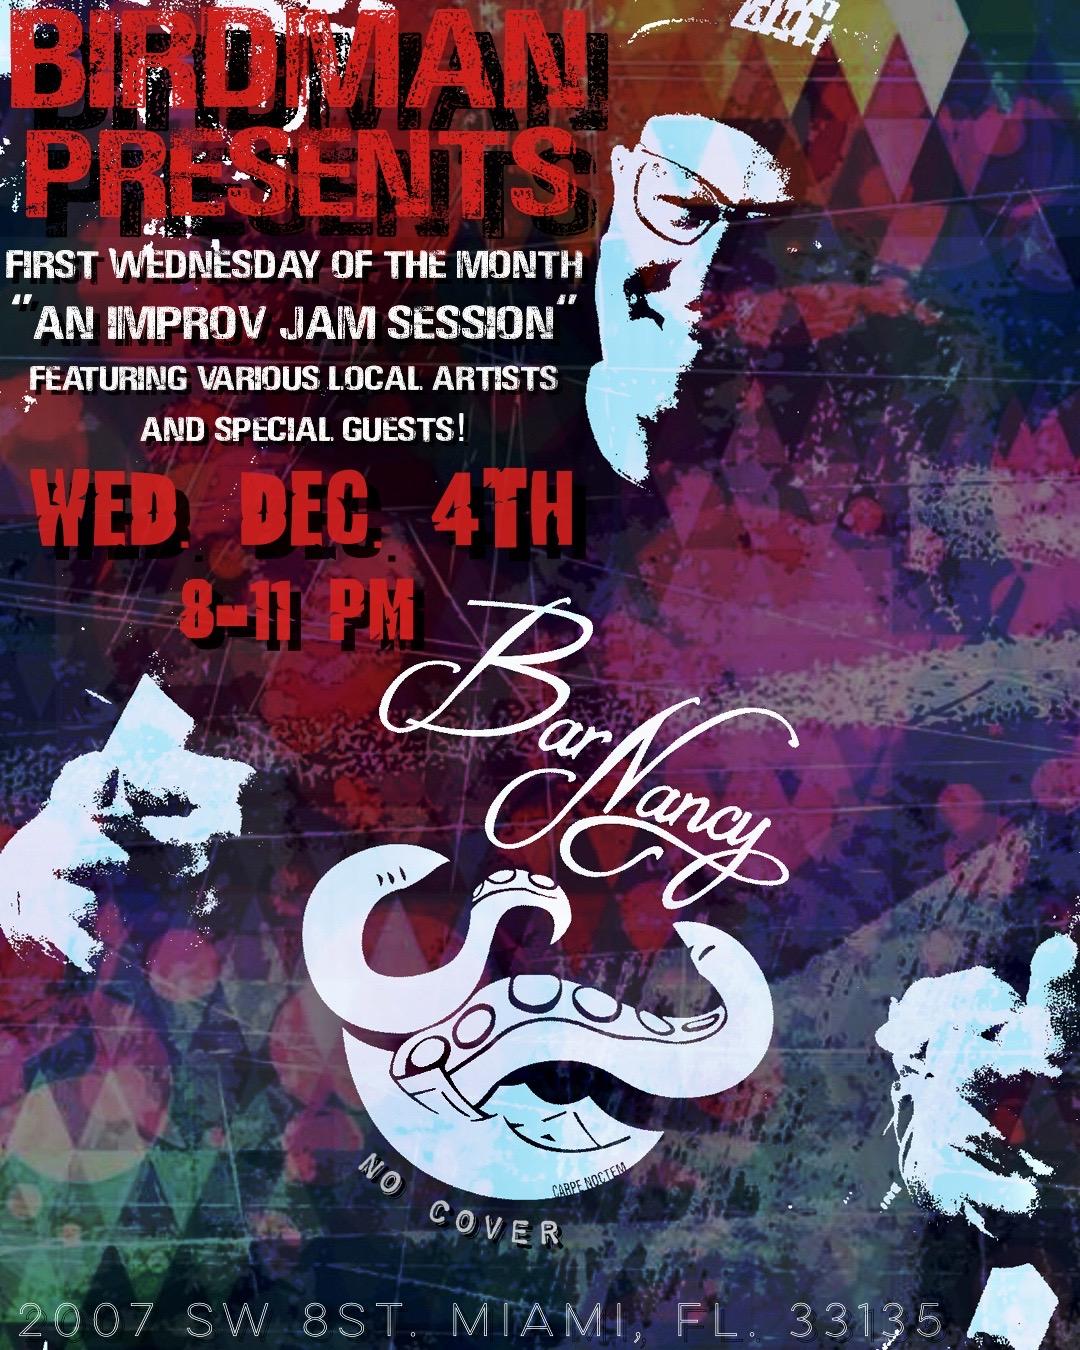 Birdman Presents 1st Wednesdays! A Very Unique Jam Session! @ Bar Nancy